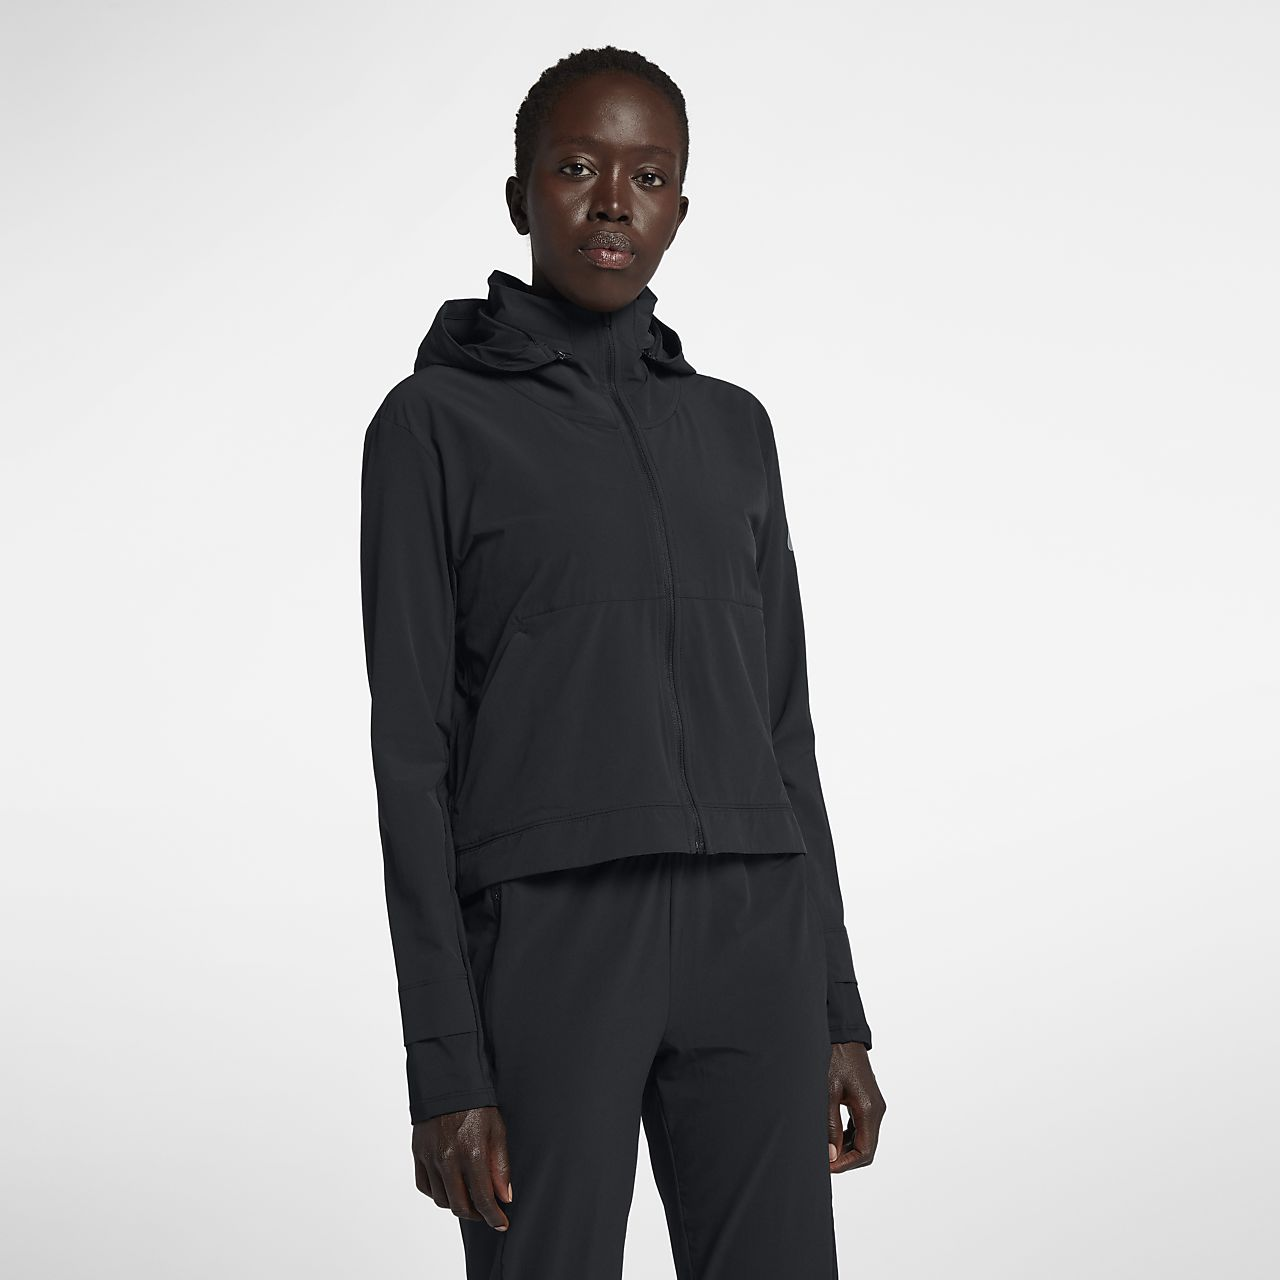 361adcaa35d2 Nike Swift Women s Running Jacket. Nike.com LU